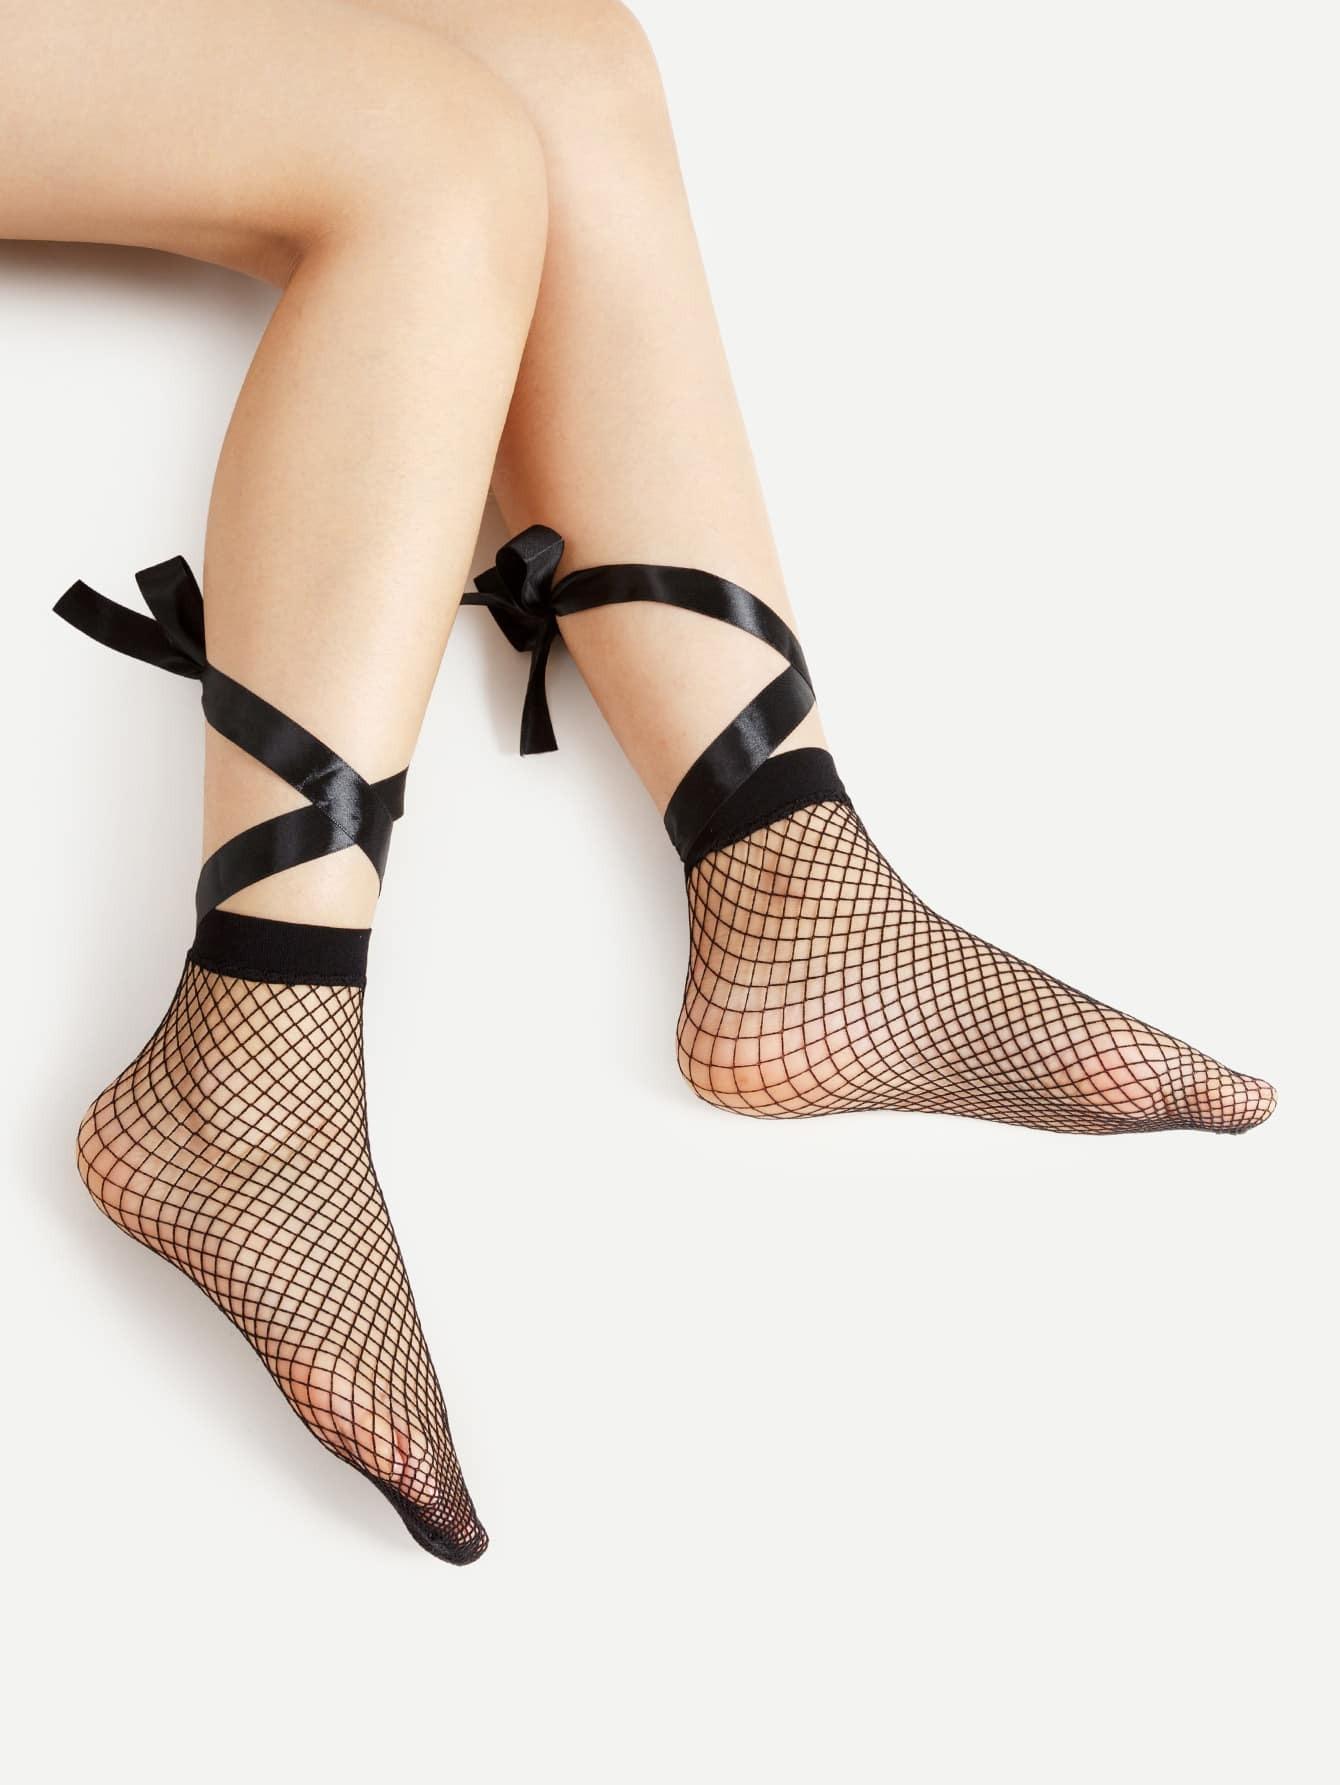 Lace Up Fishnet Ankle Socks